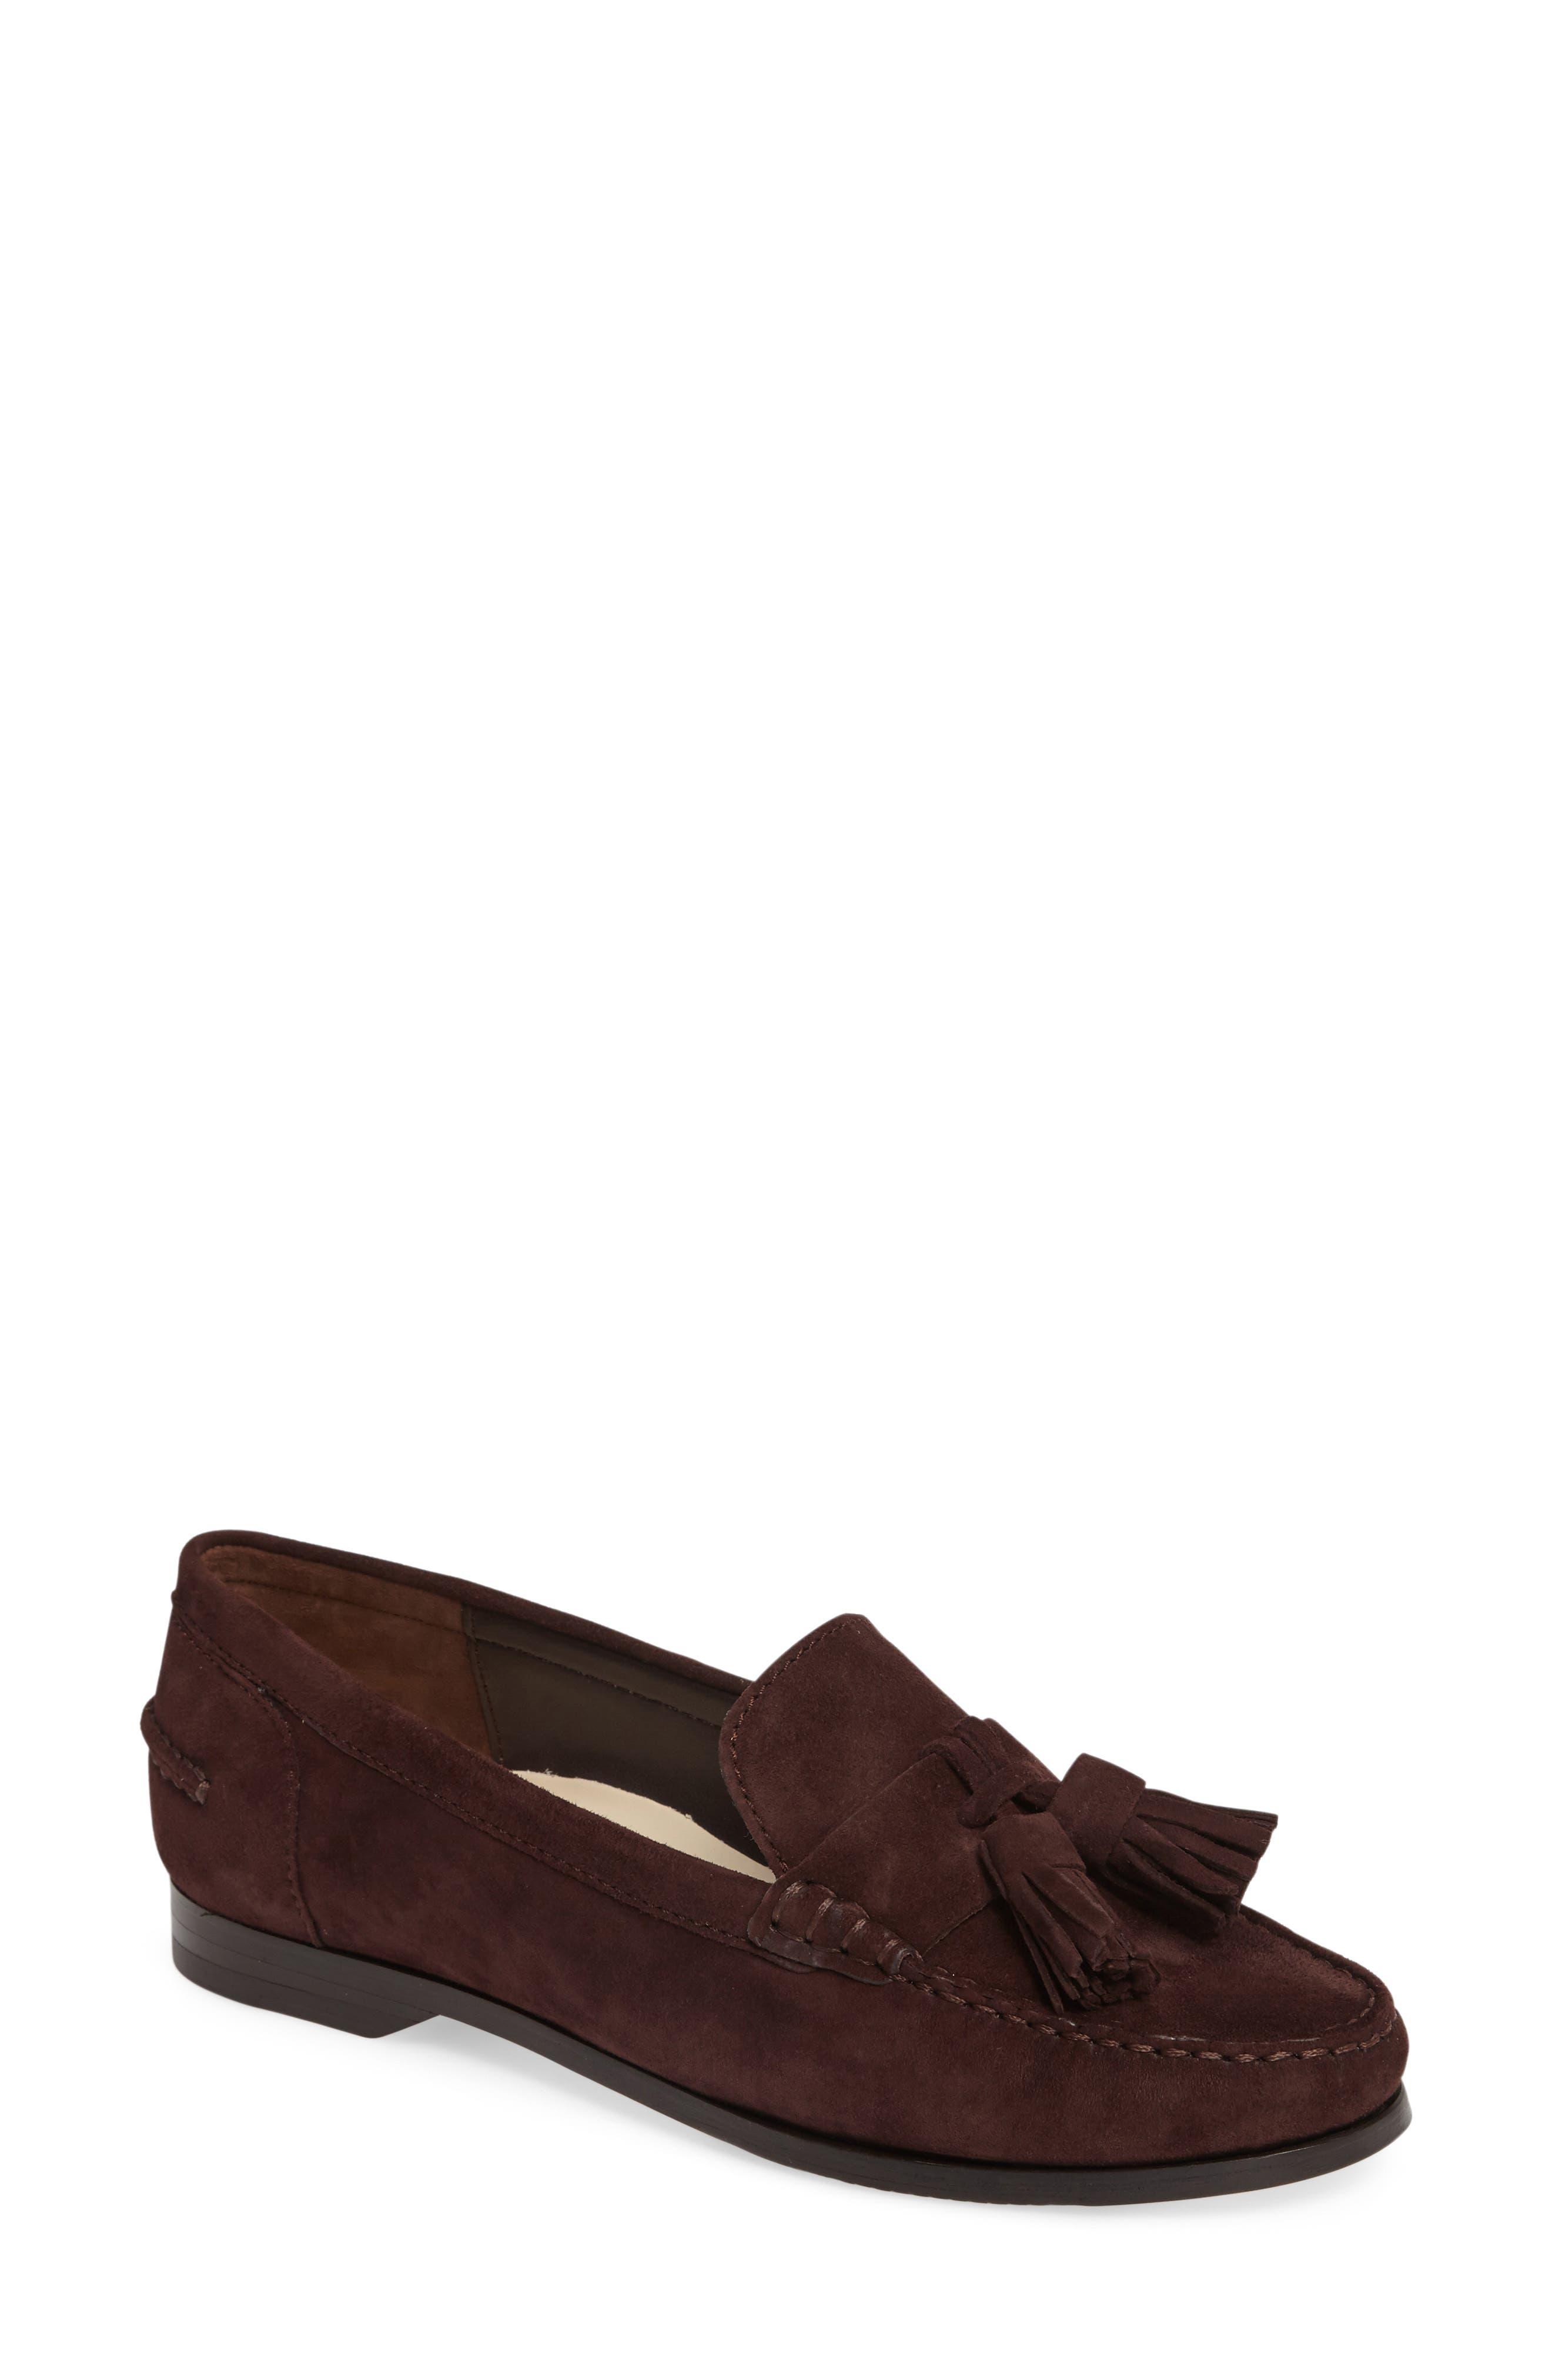 'Pinch Grand' Tassel Loafer, Main, color, 200